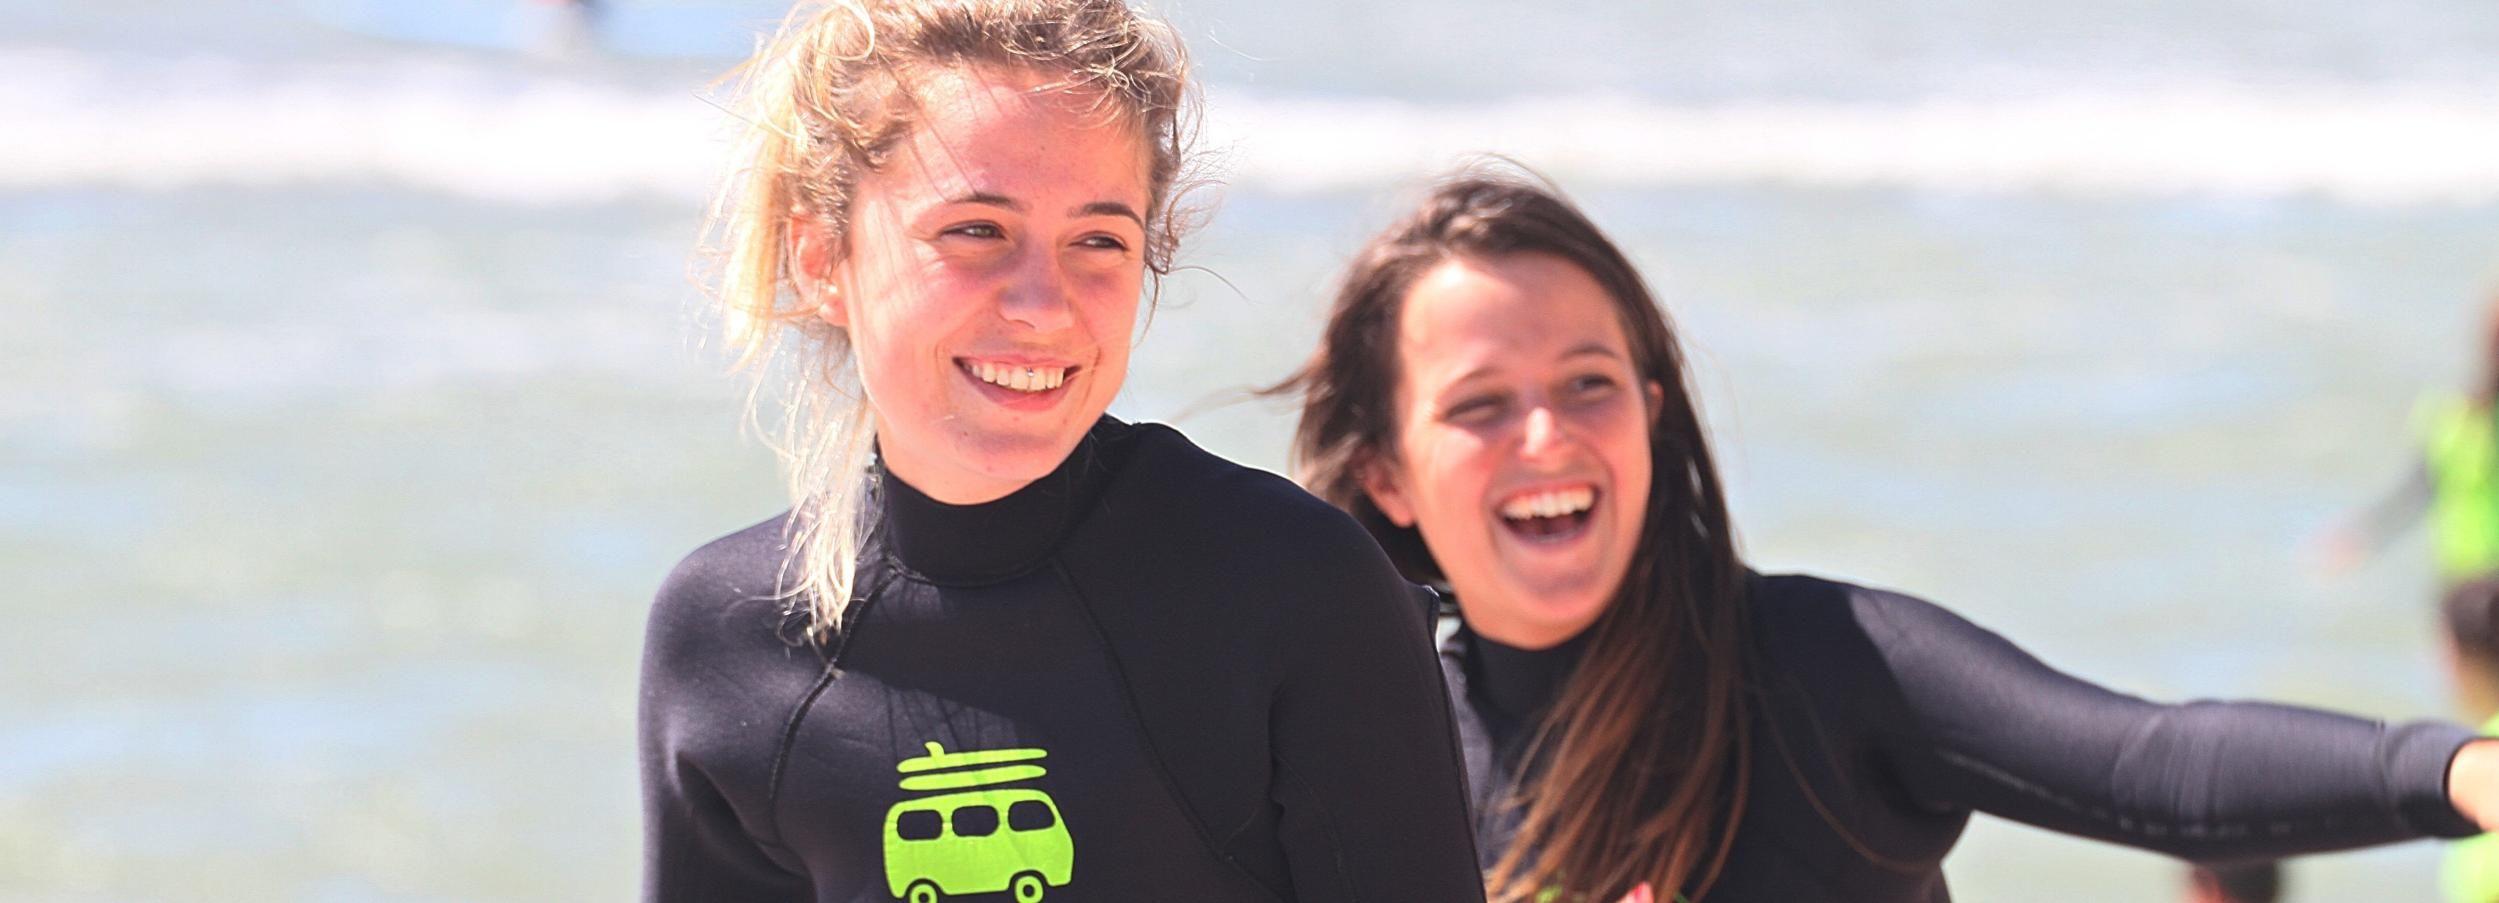 Ericeira: lecciones privadas de surf de 2 horas